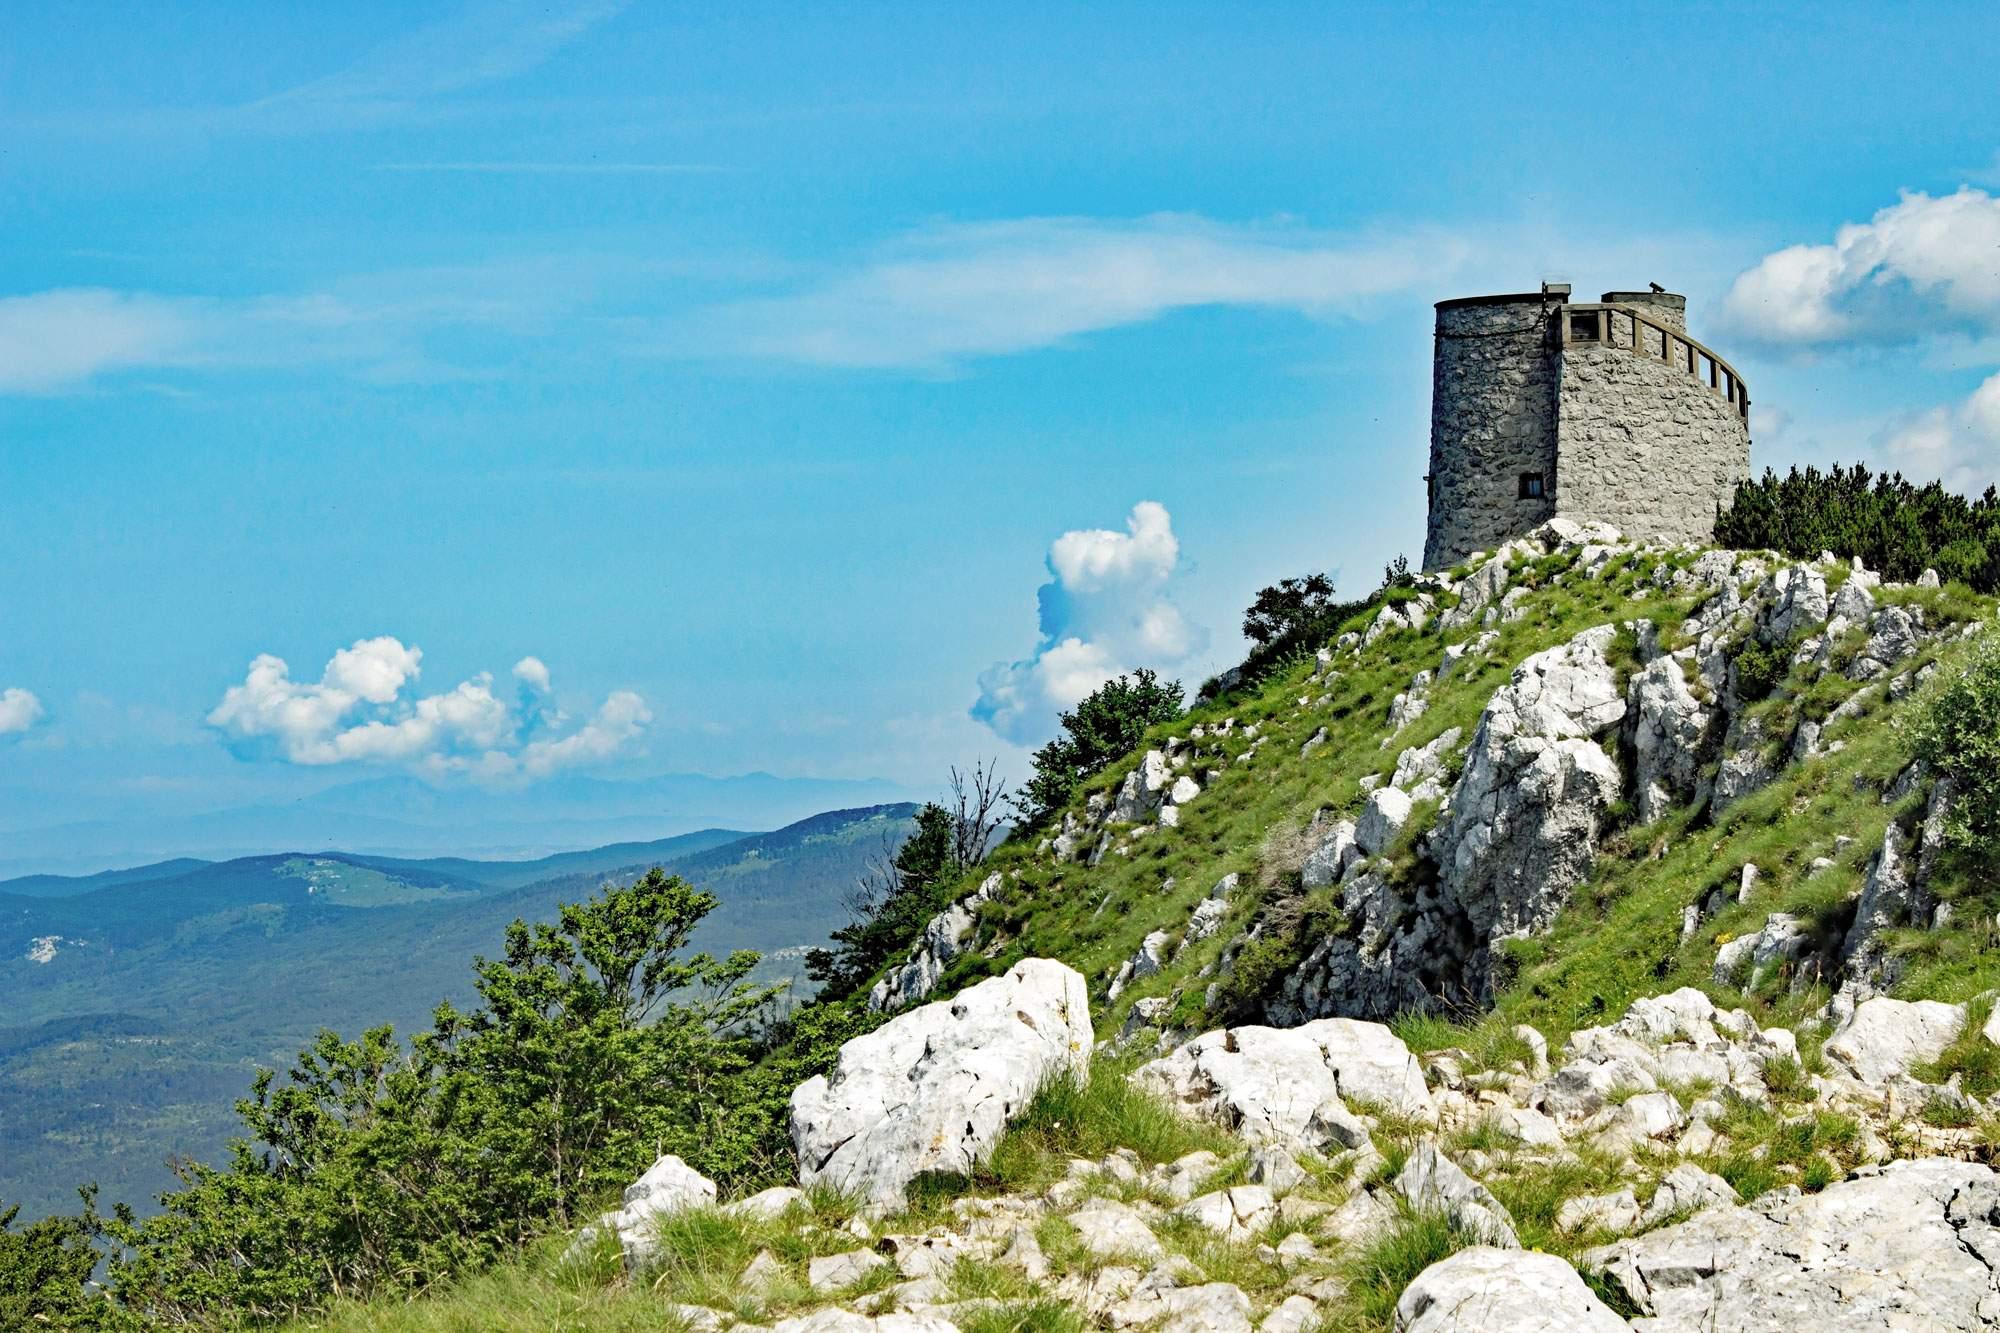 vojak-ucka-national-park-croatia-hiking-outdoor-travel